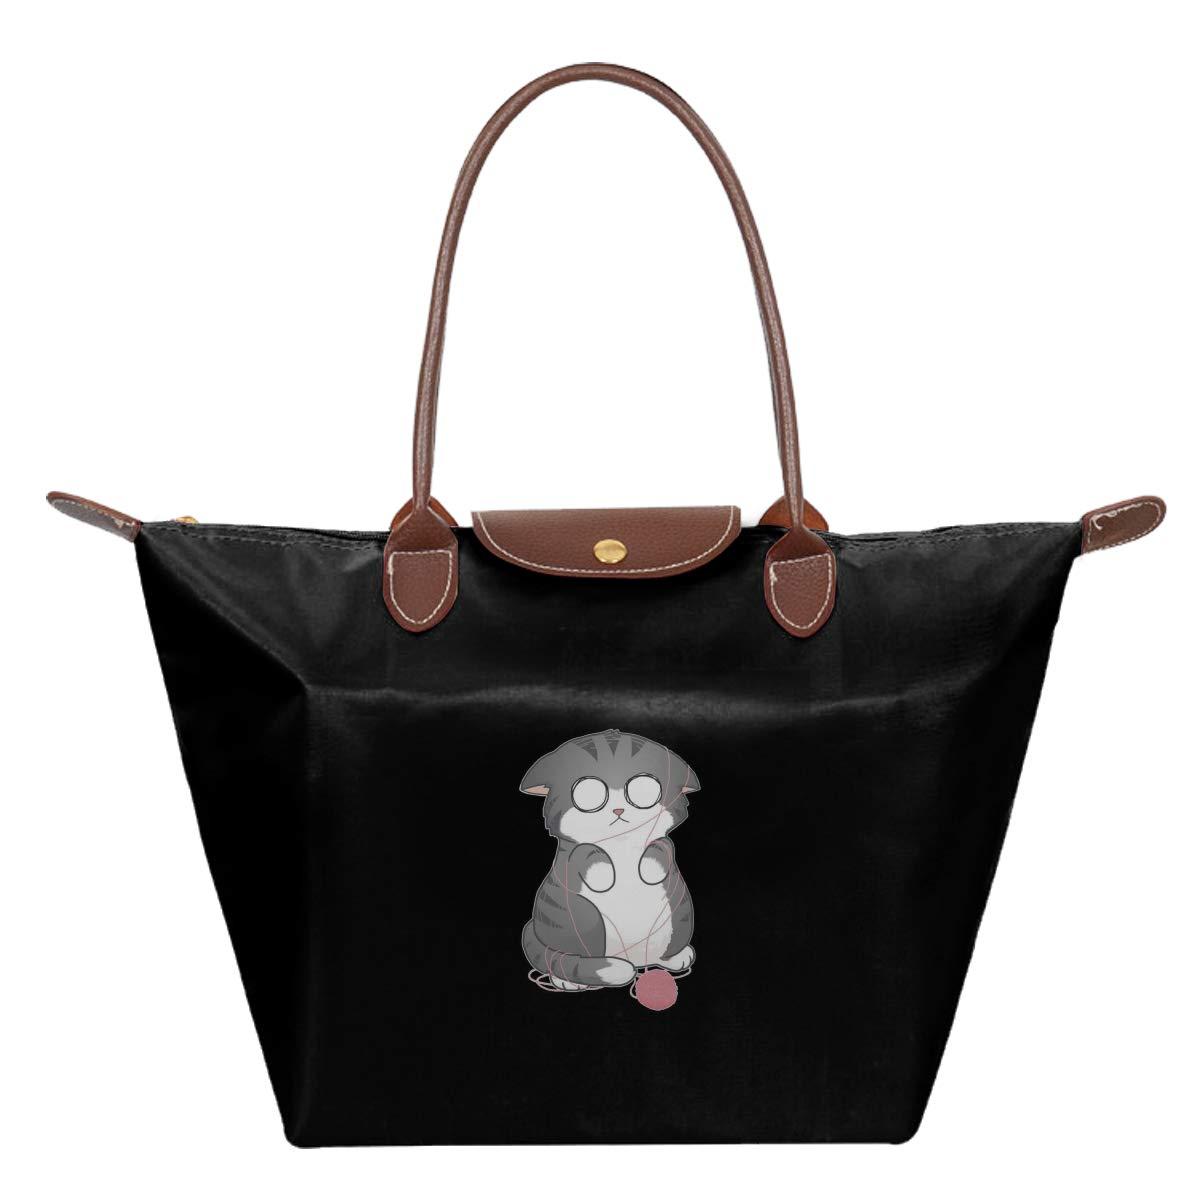 Confused Kitty Waterproof Leather Folded Messenger Nylon Bag Travel Tote Hopping Folding School Handbags